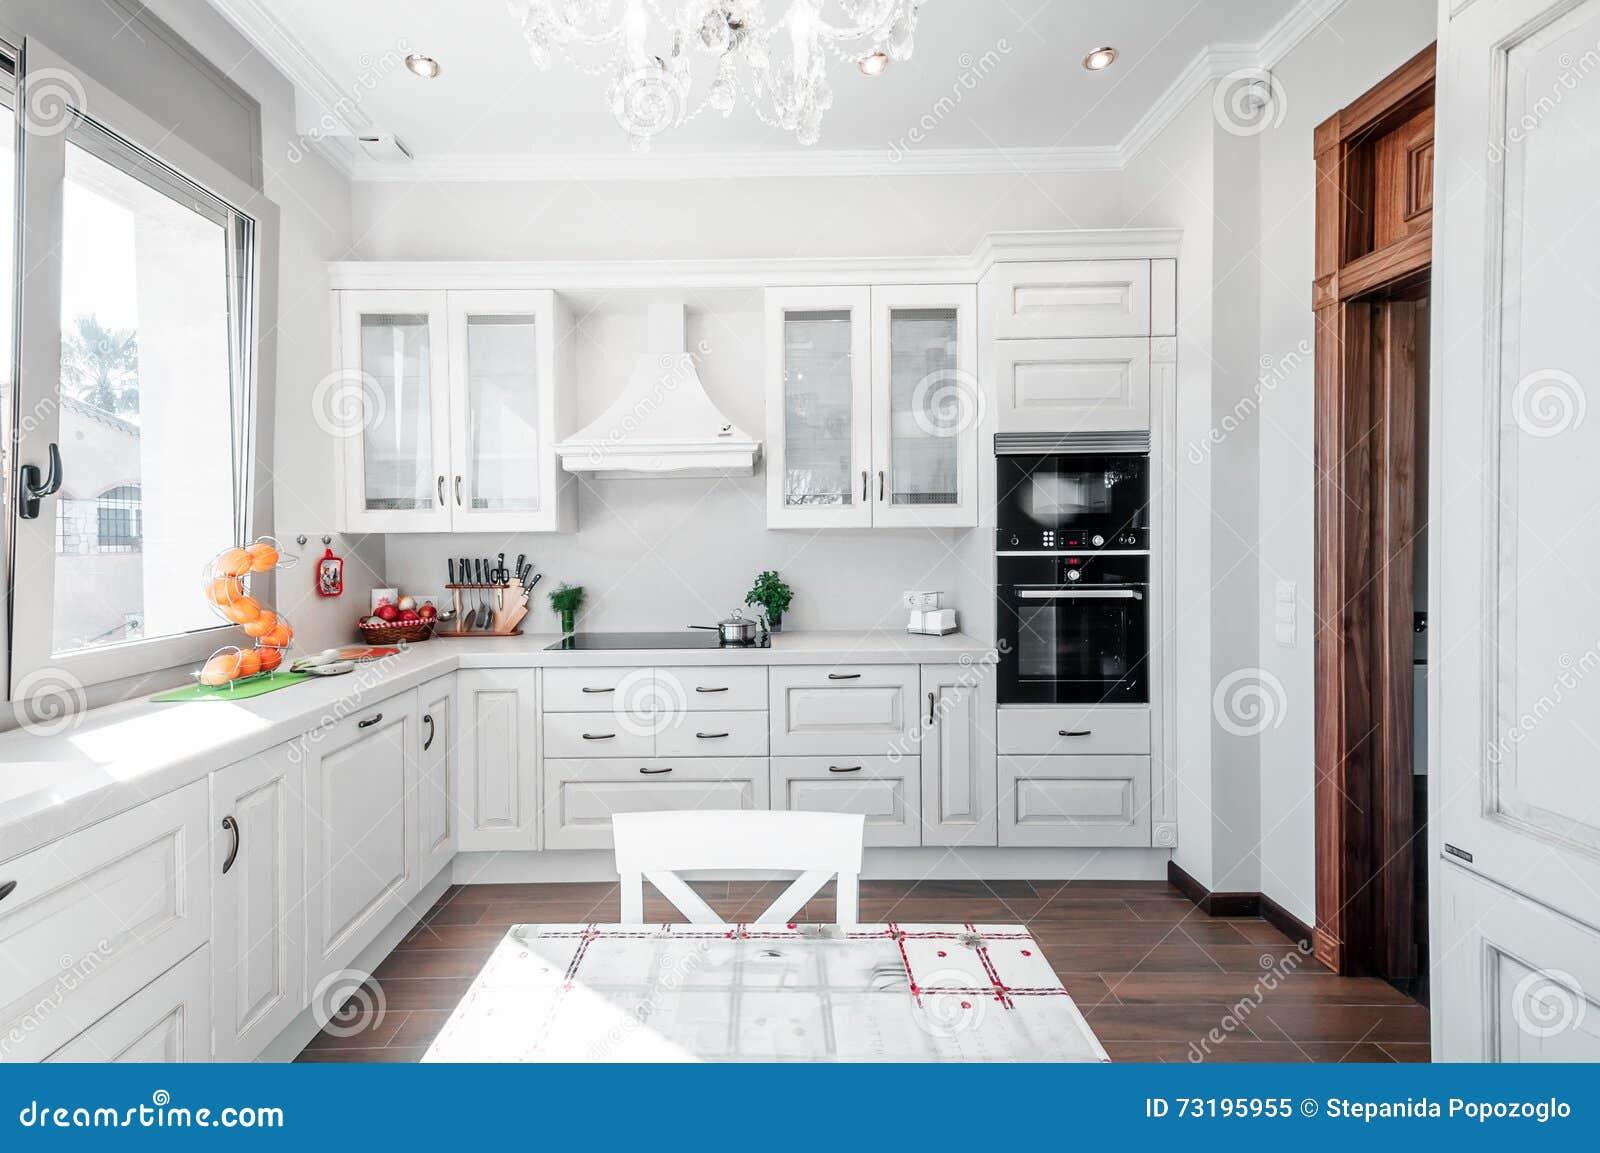 Maison moderne de luxe interieur cuisine for Cuisine luxe moderne